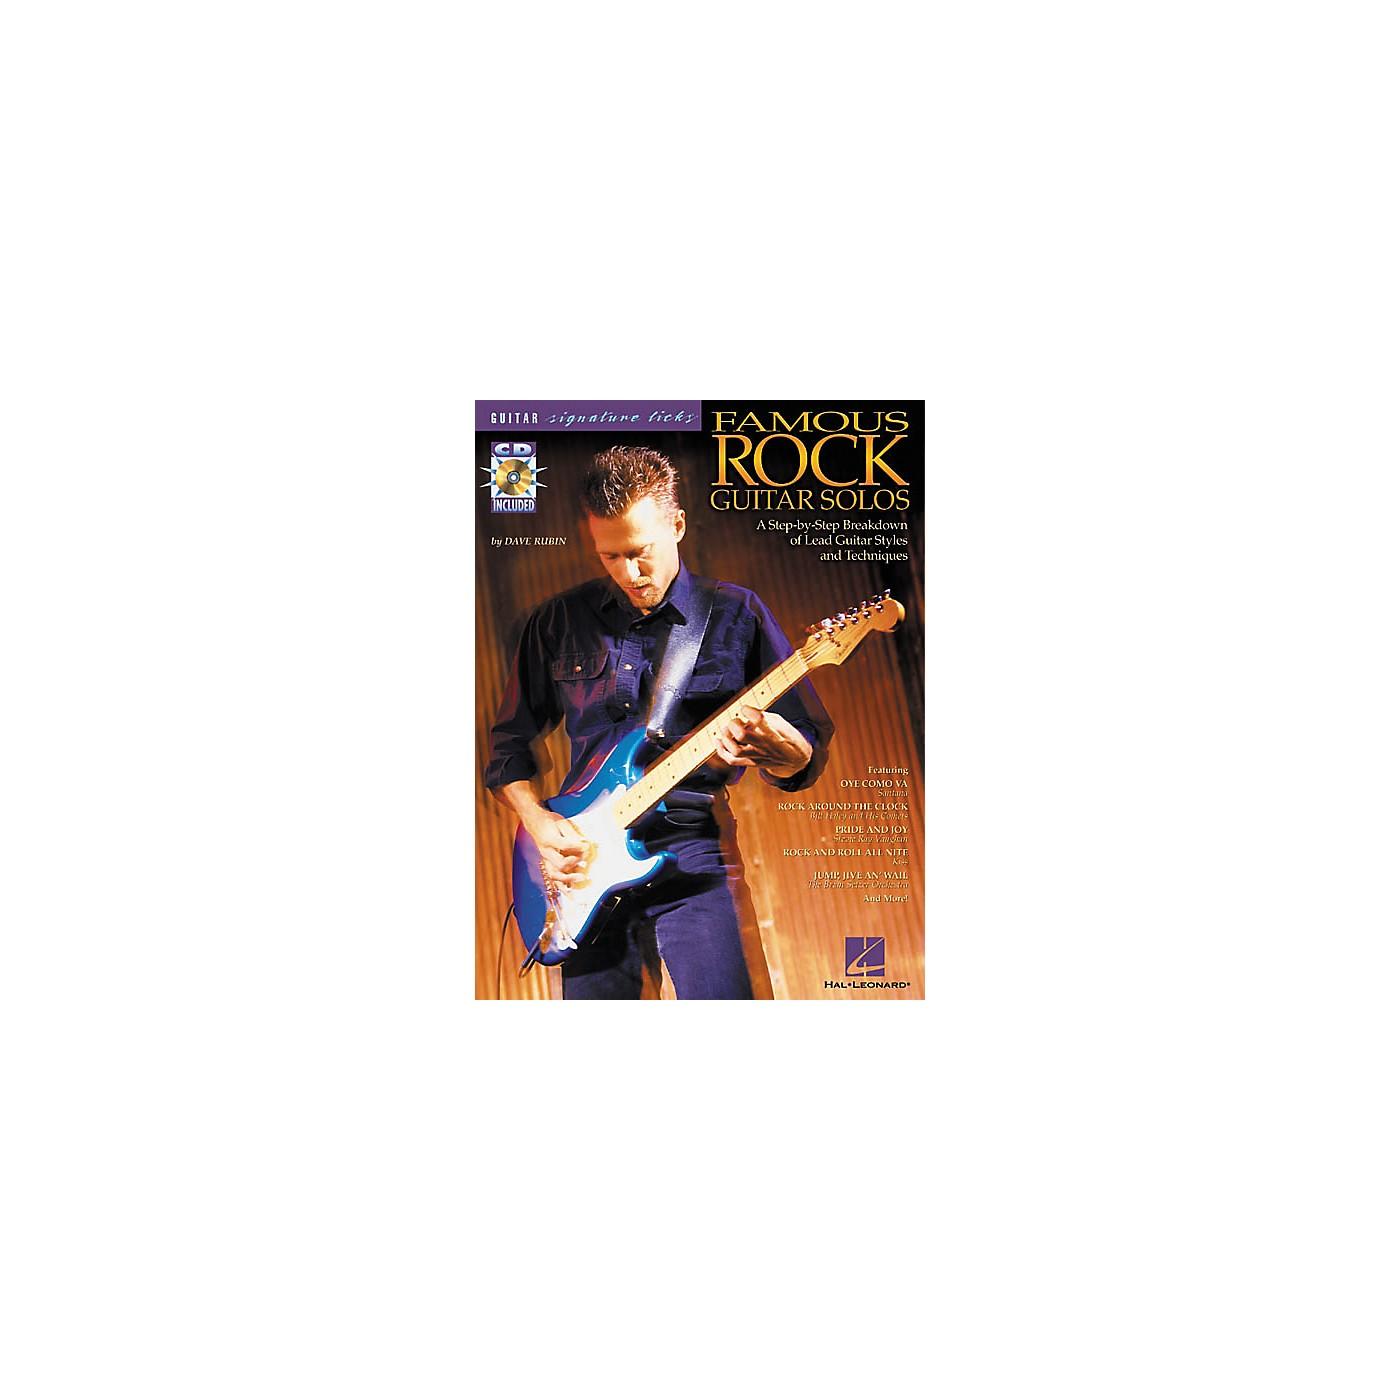 Hal Leonard Famous Rock Guitar Solos Signature Licks Book with CD thumbnail